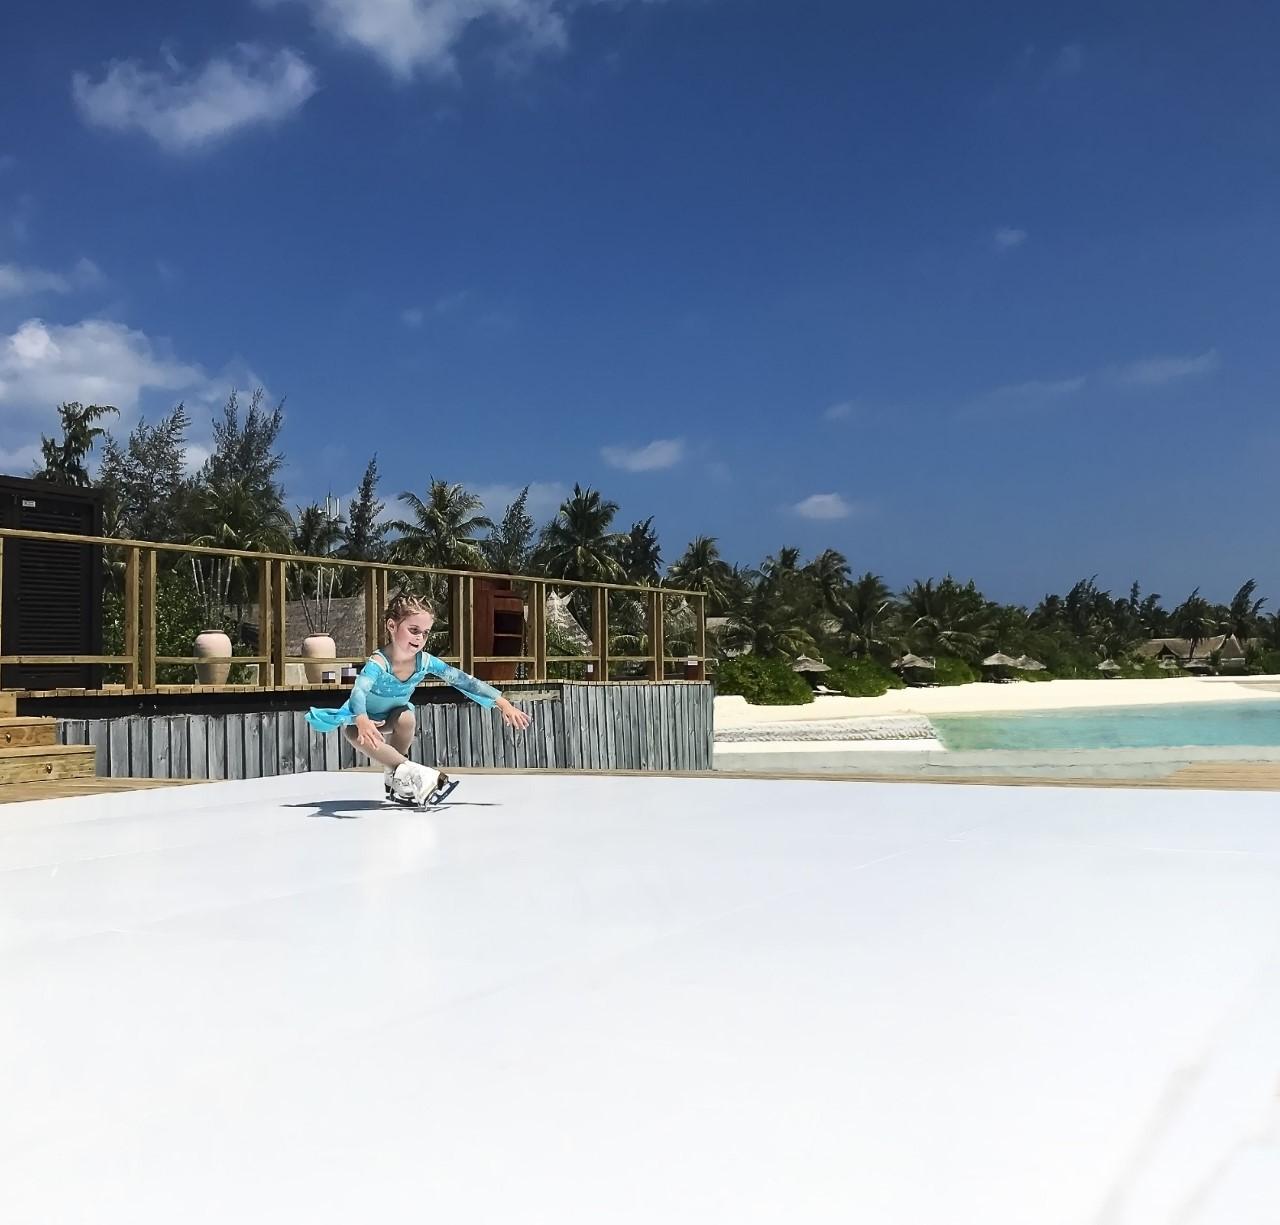 ice rink maldives